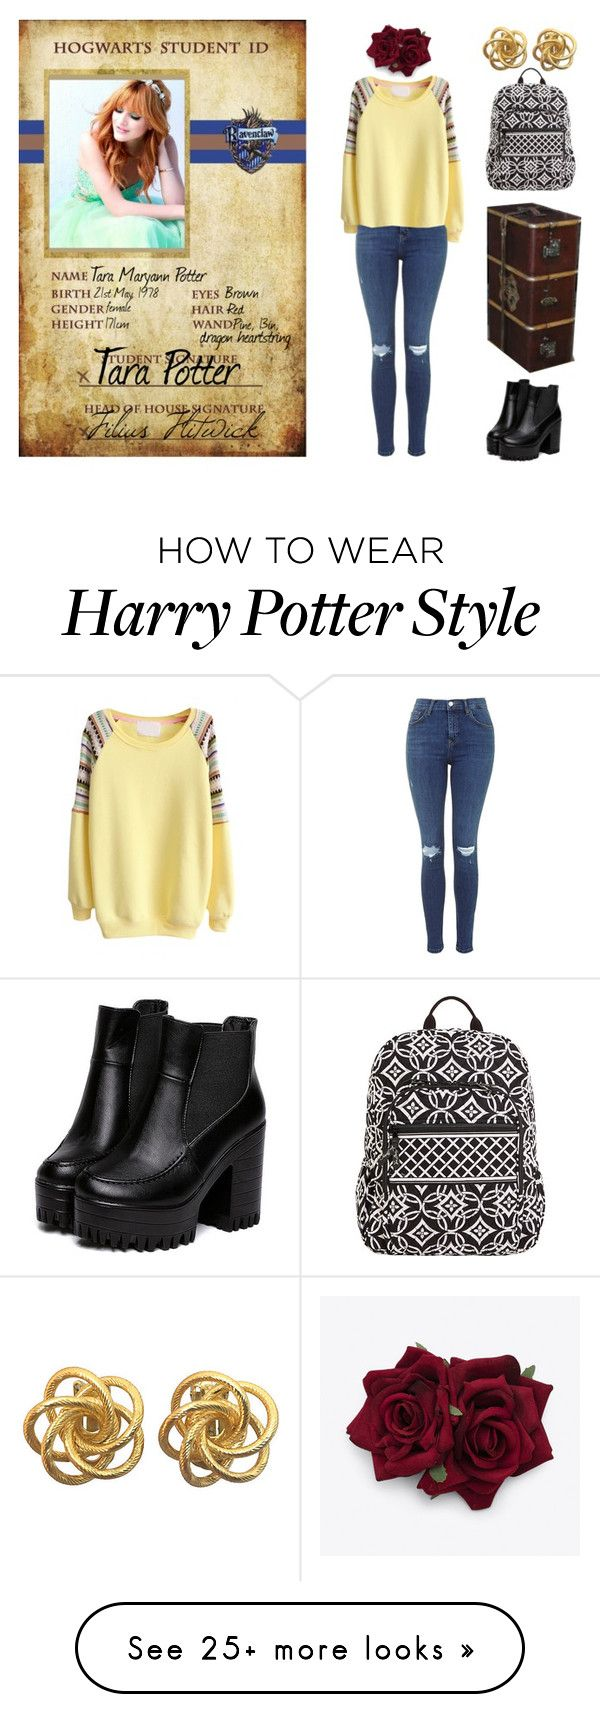 """Harry Potter OC - Tara Potter NEW VERSION"" by amalie-adamovska on Polyvore featuring Sherri Hill and Vera Bradley"